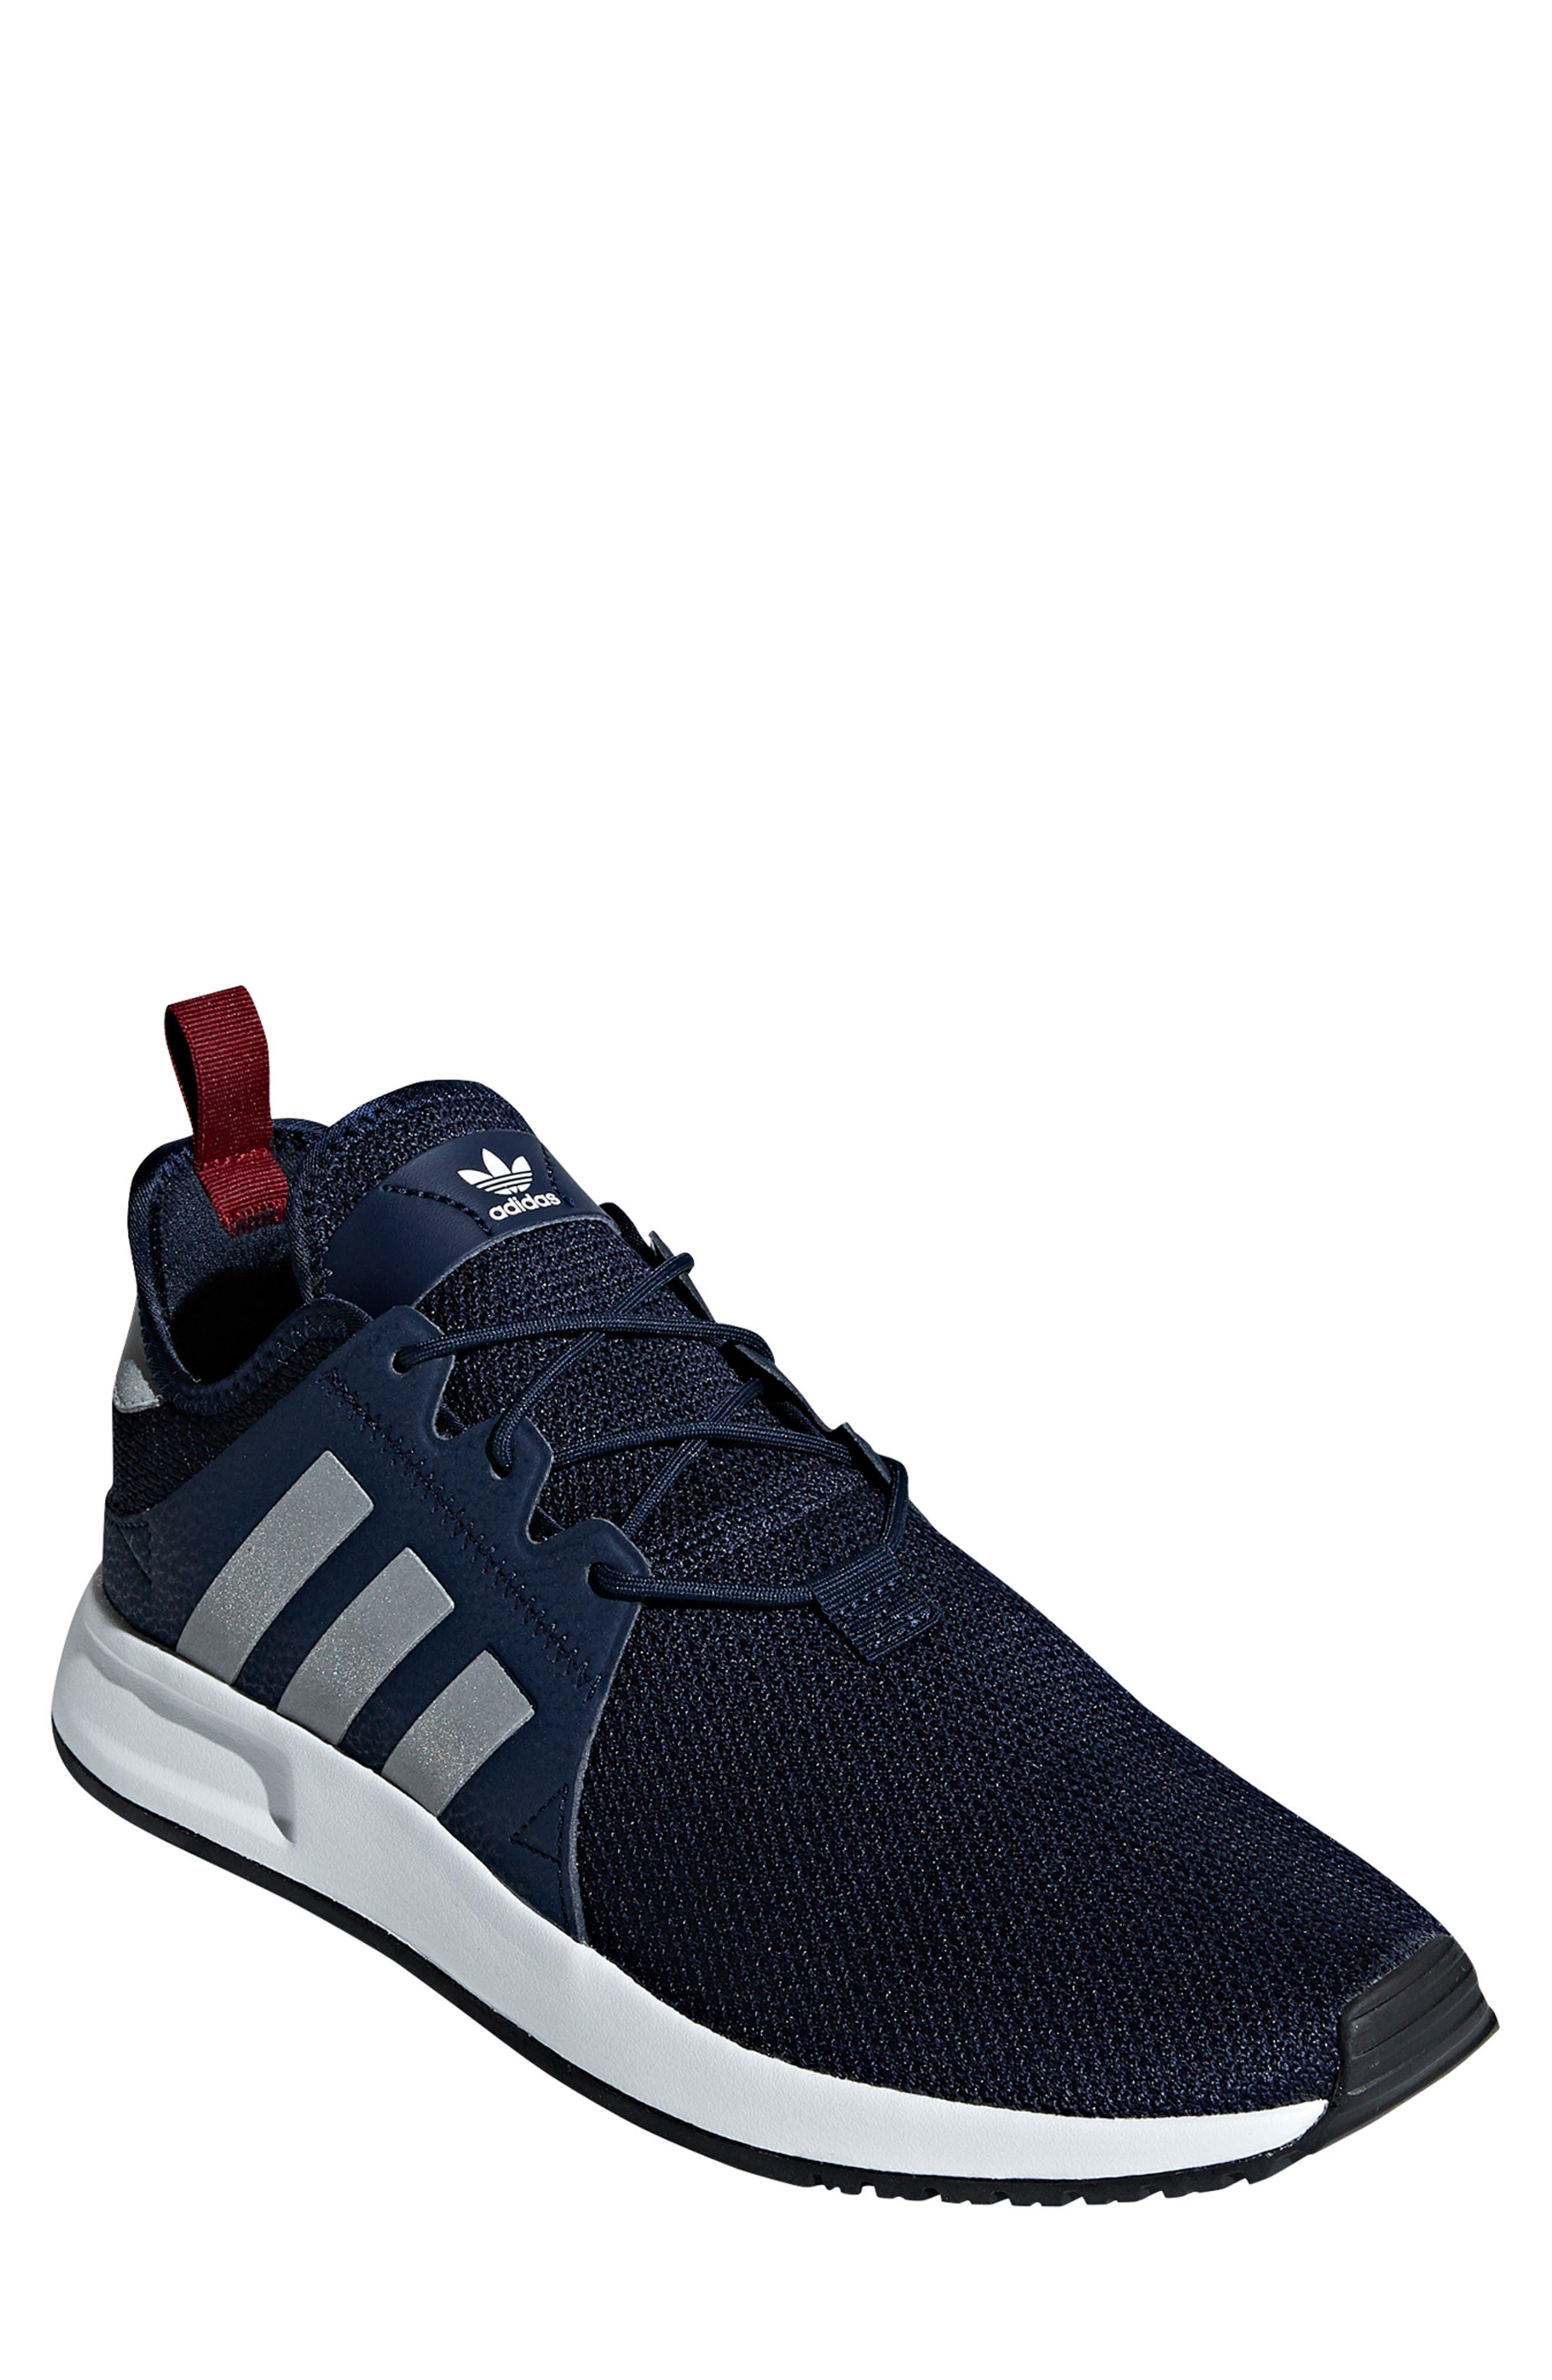 Adidas X Plr Sneaker